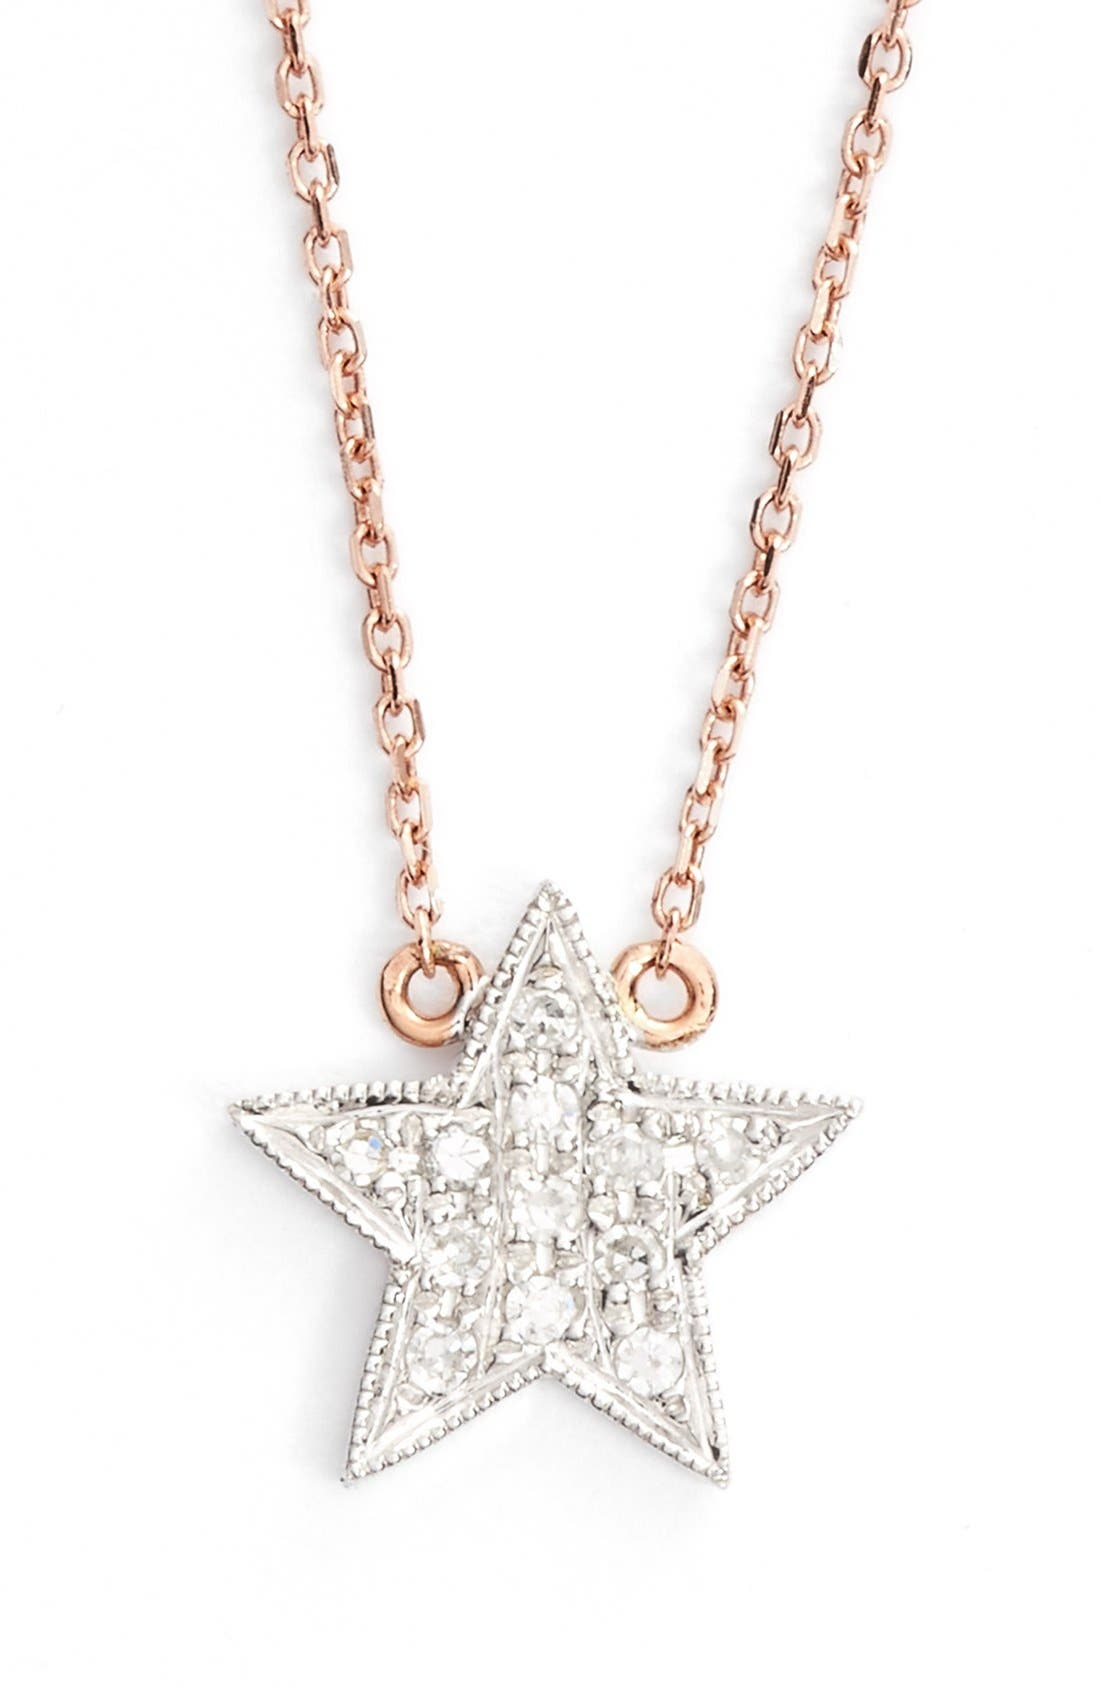 Dana Rebecca Designs 'Julianne Himiko' Diamond Star Pendant Necklace